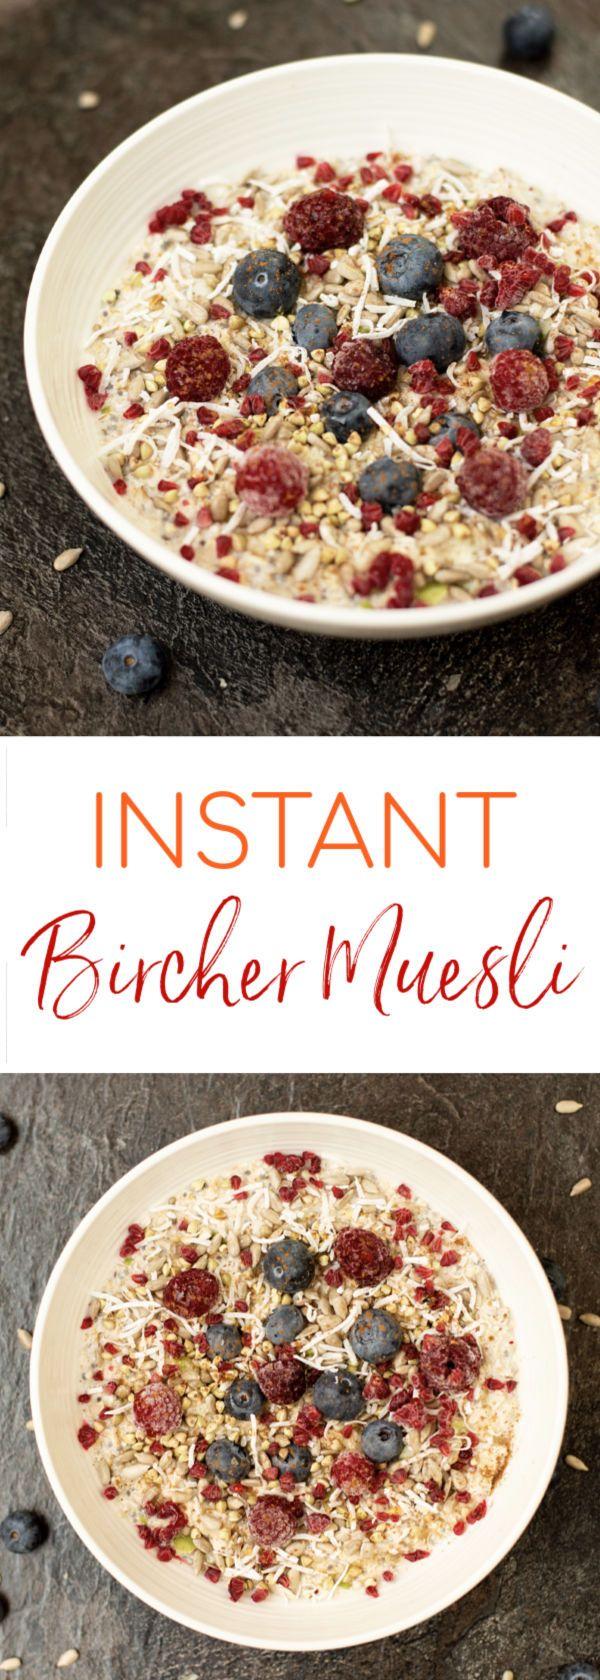 Instant Bircher Muesli | Muesli, Brunch recipes, Bircher ...